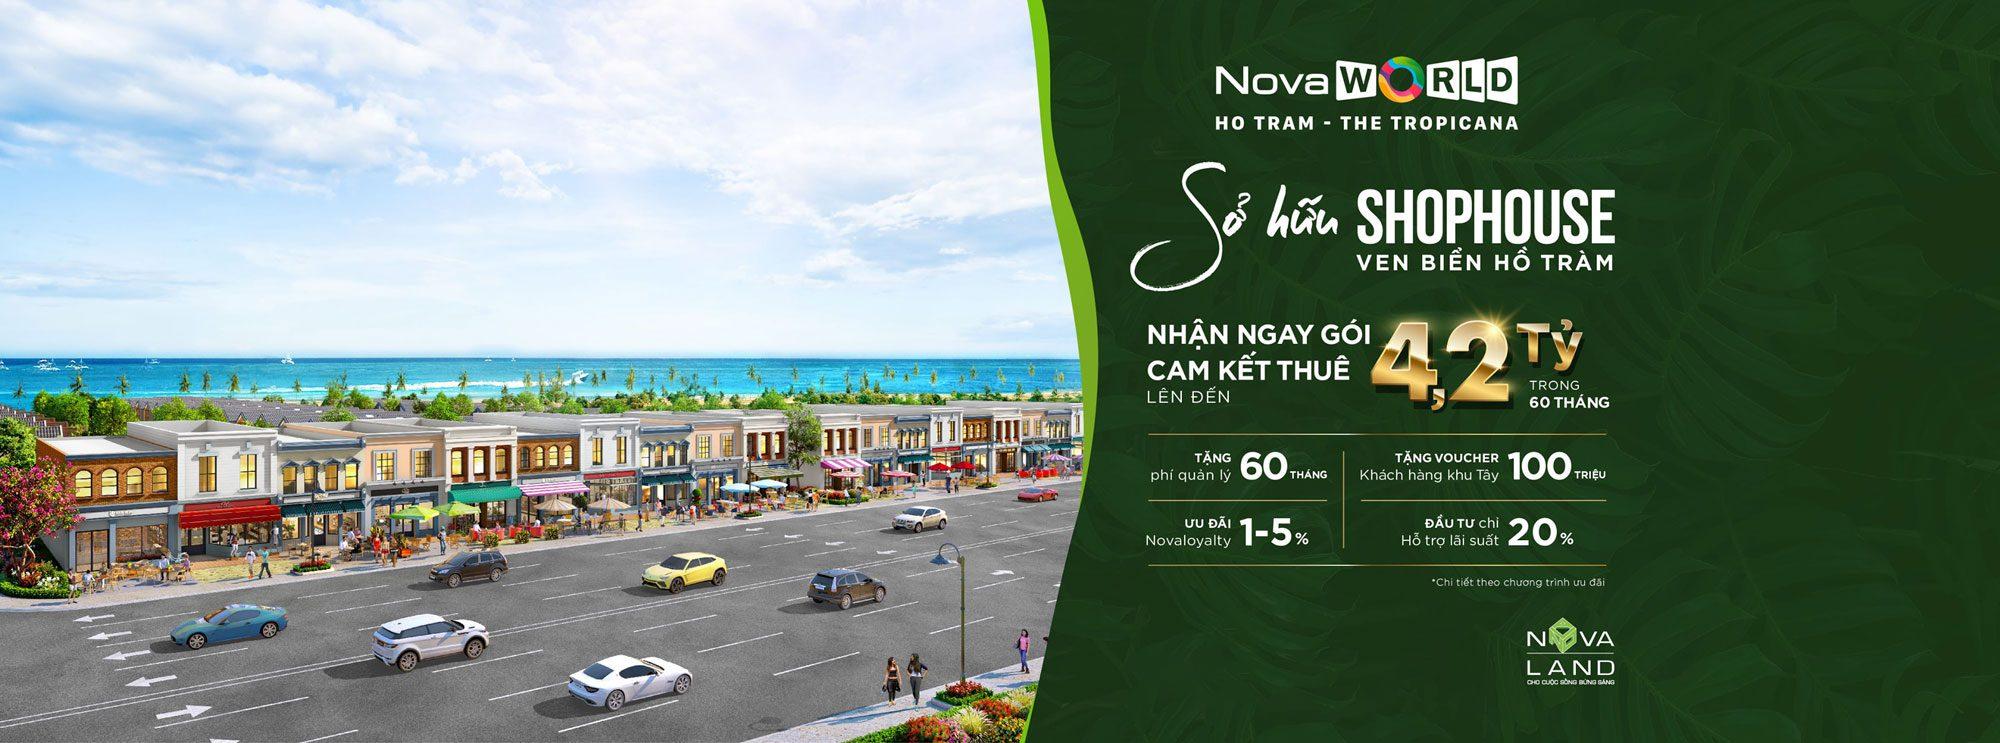 Shophouse Tropicana NovaWorld Hồ Tràm